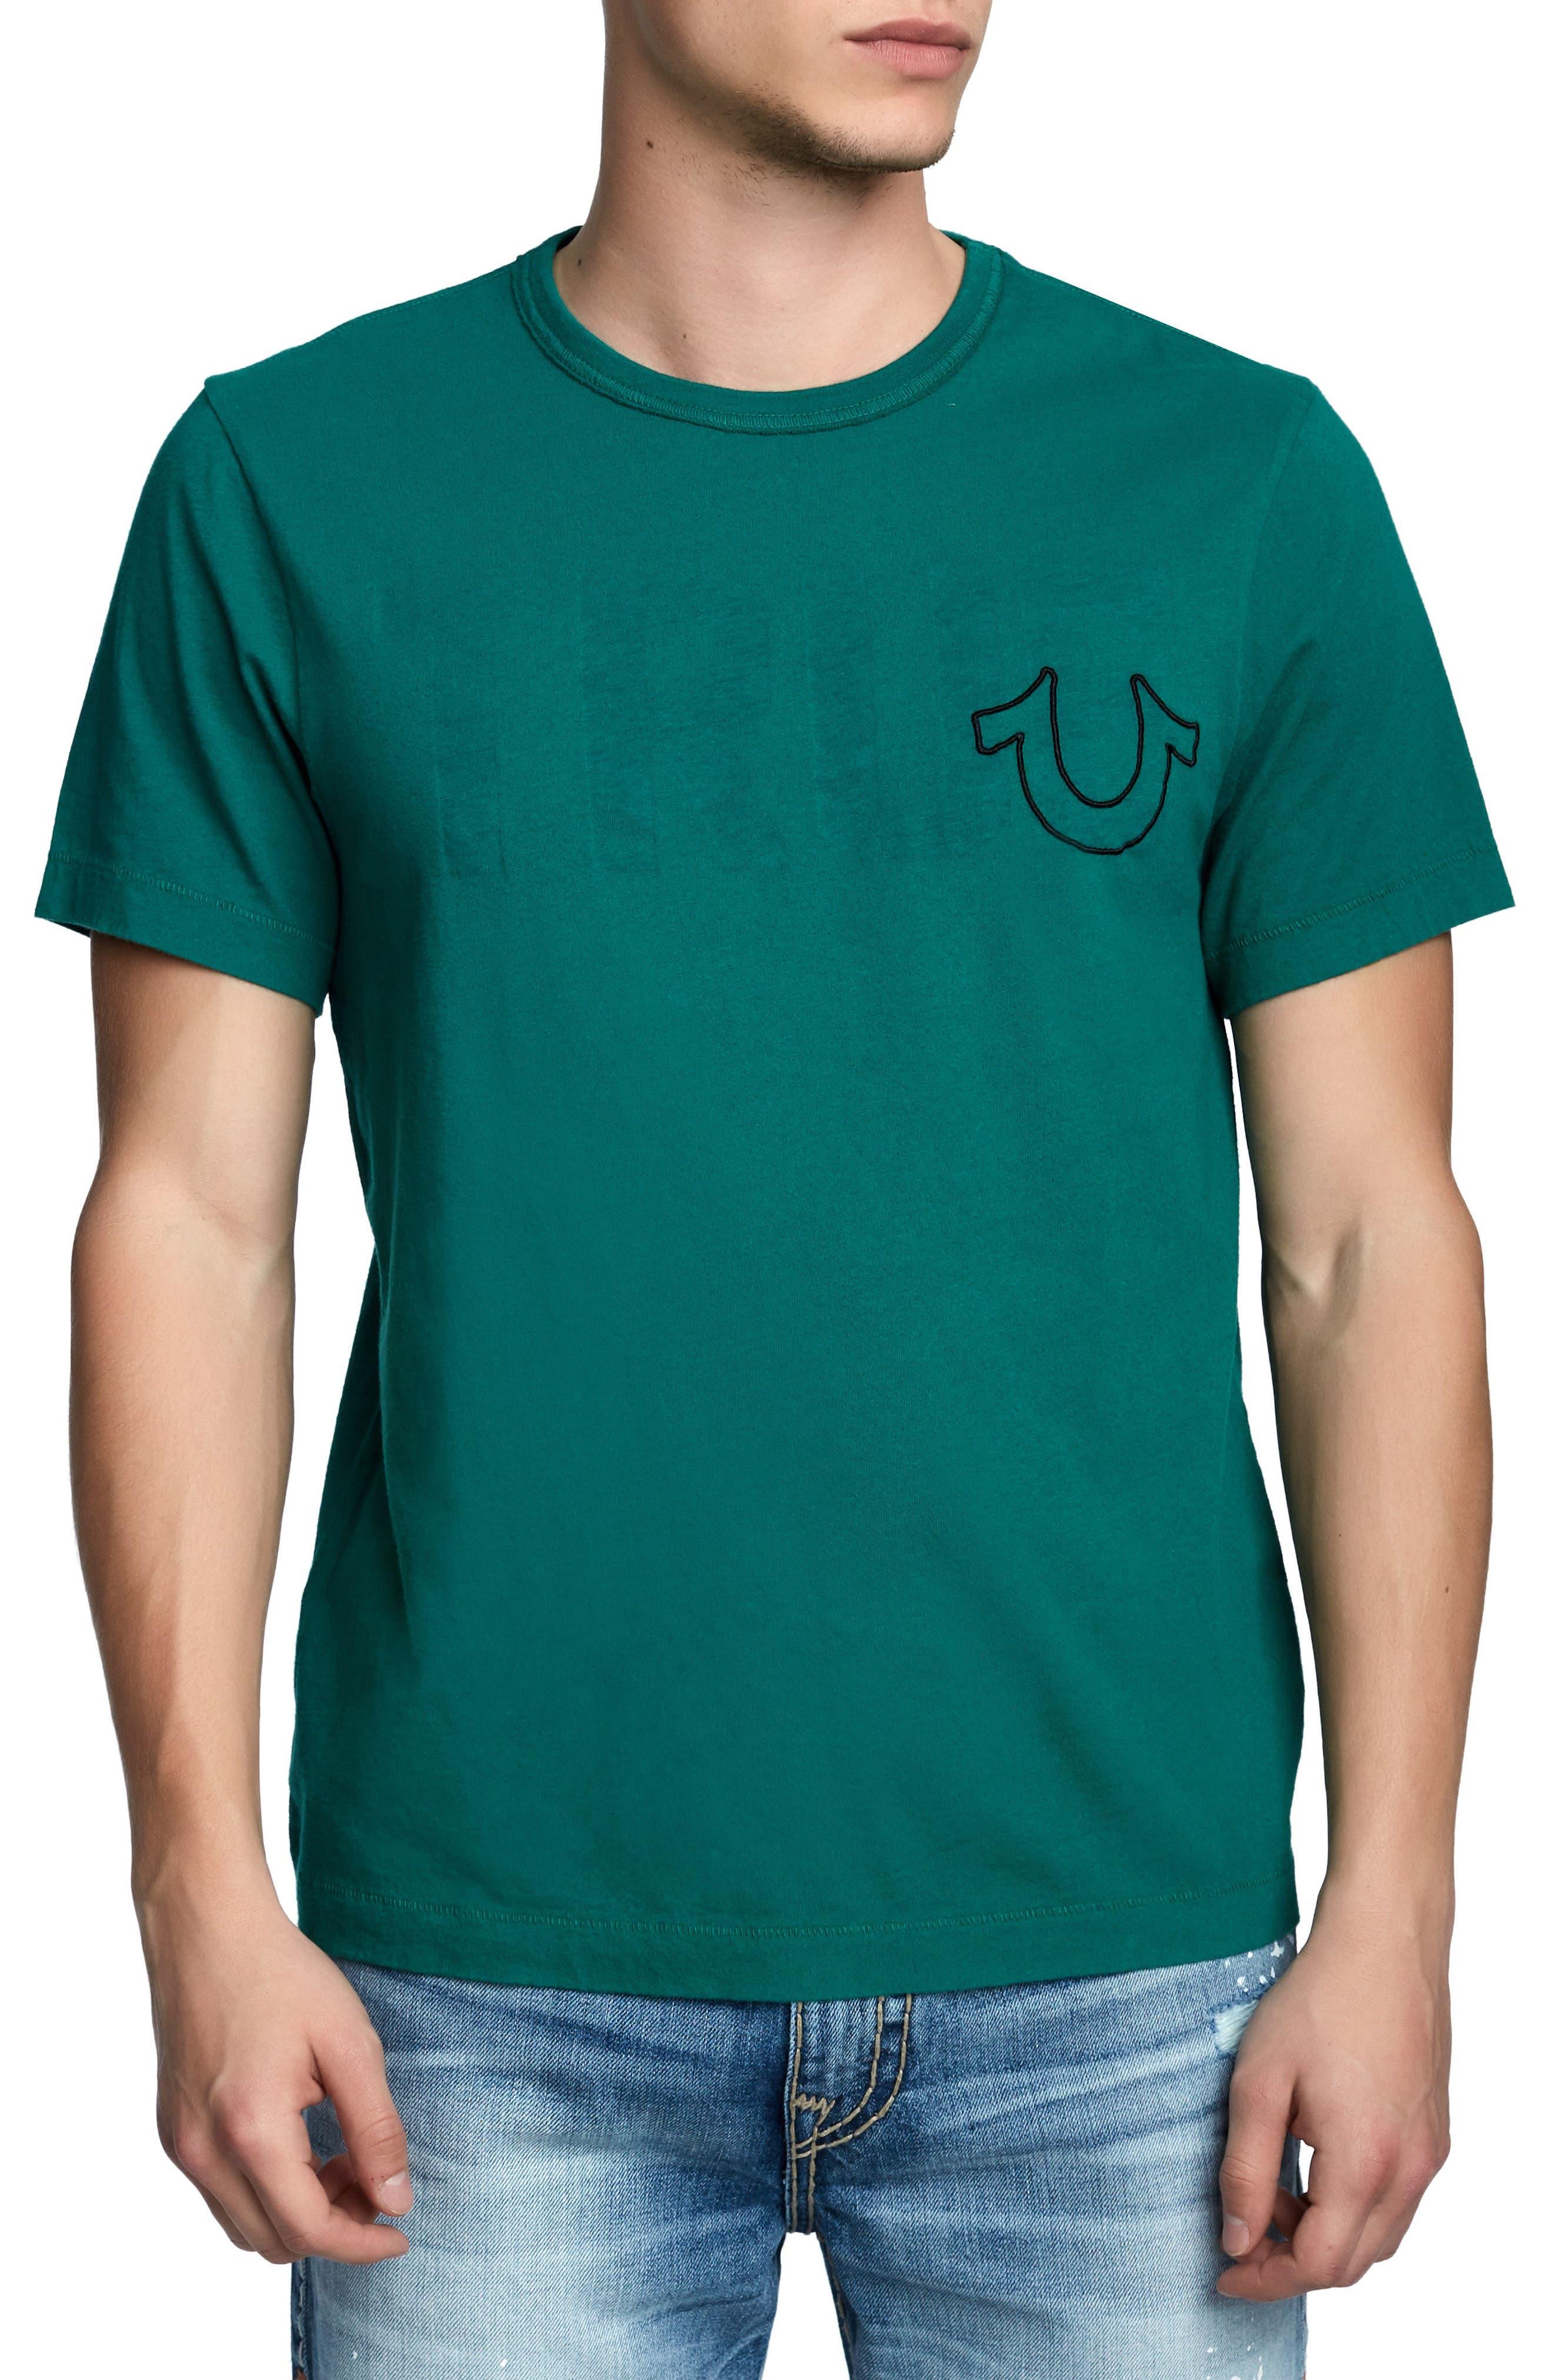 True Slogan T-Shirt,                         Main,                         color, DARK AGAVE